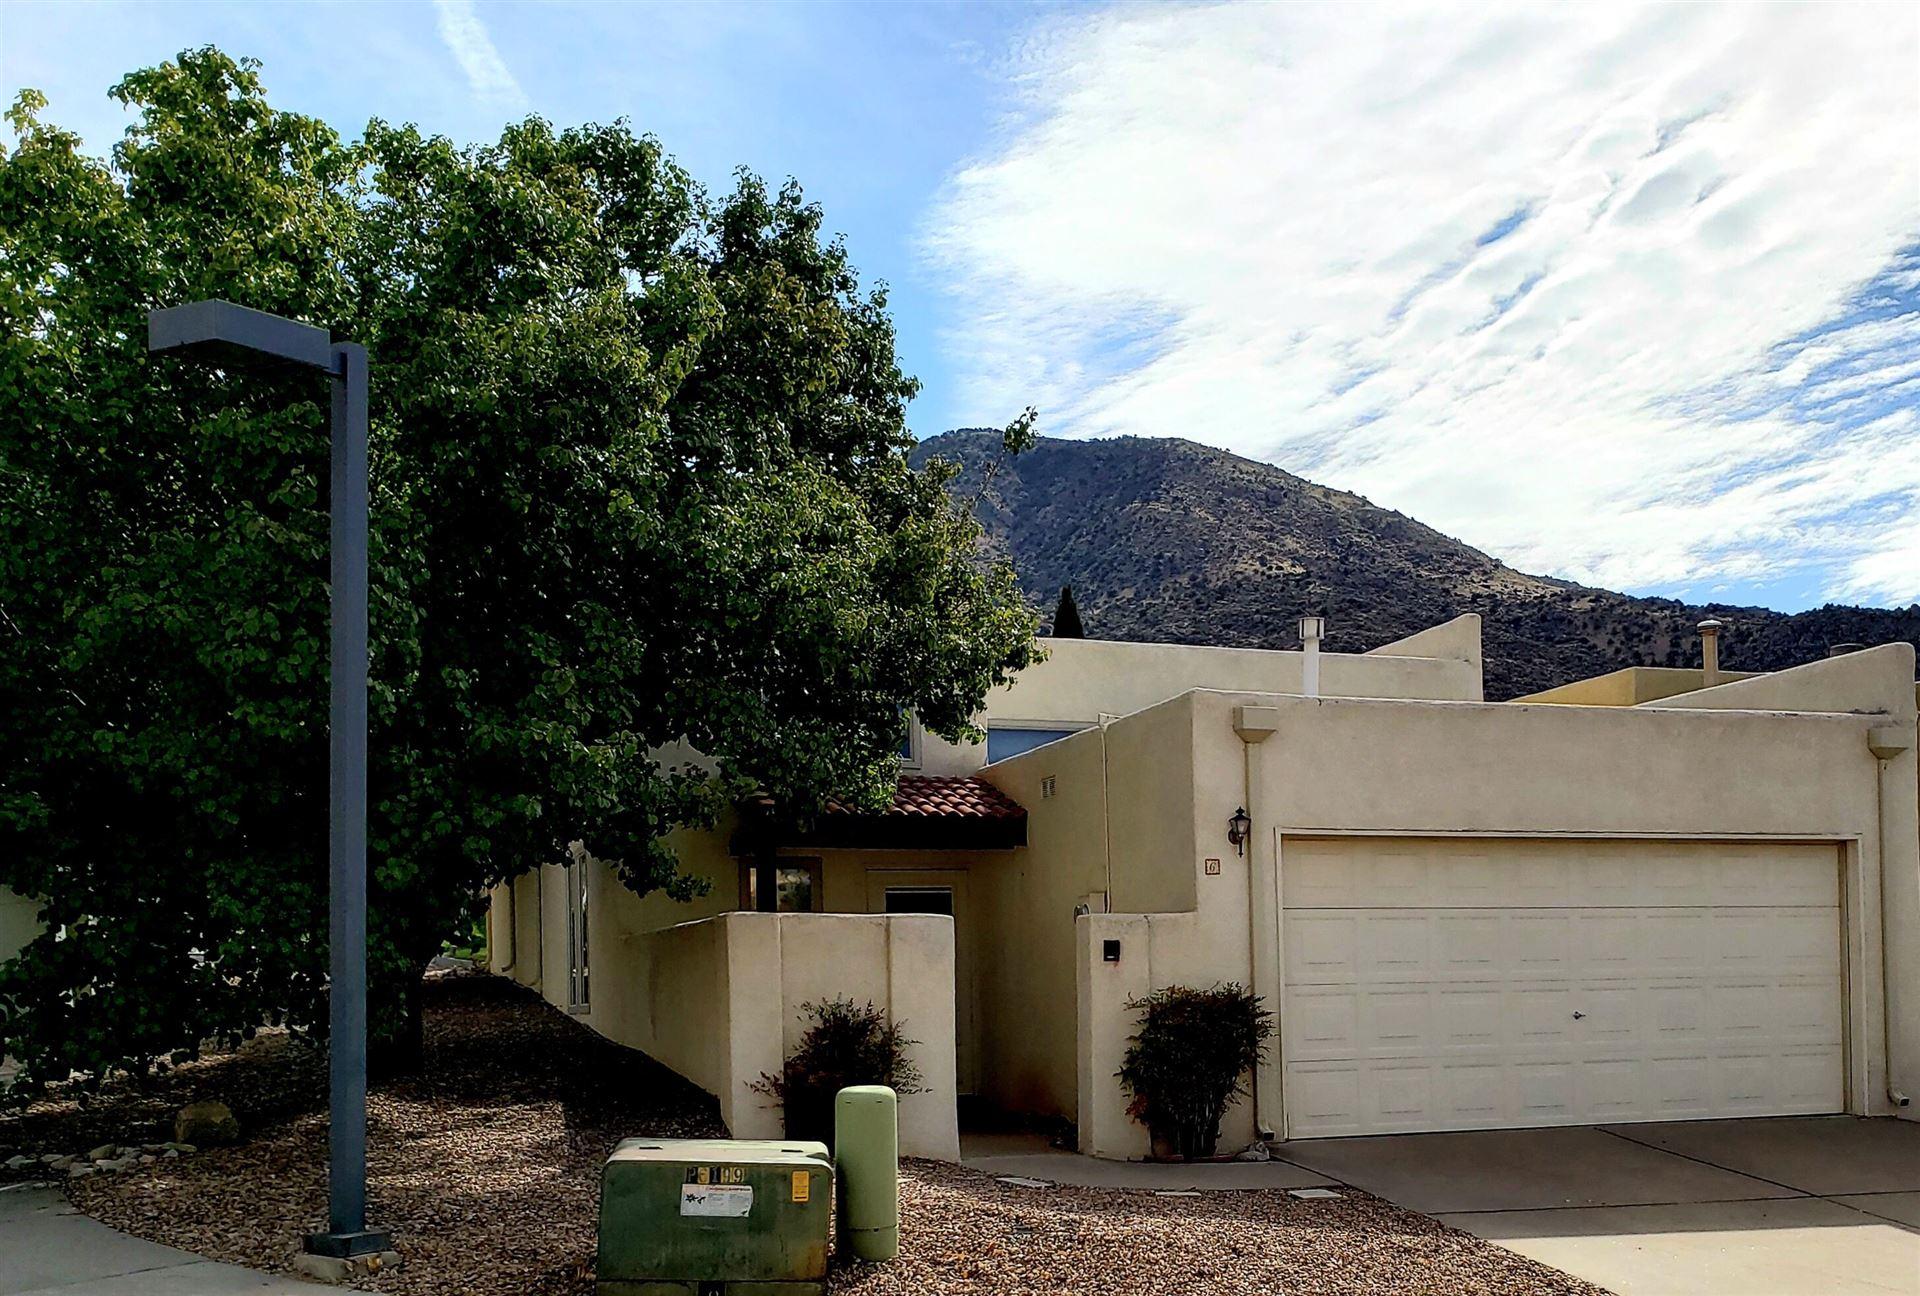 Photo for 6 PHEASANT HILL Drive NE, Albuquerque, NM 87111 (MLS # 1001751)